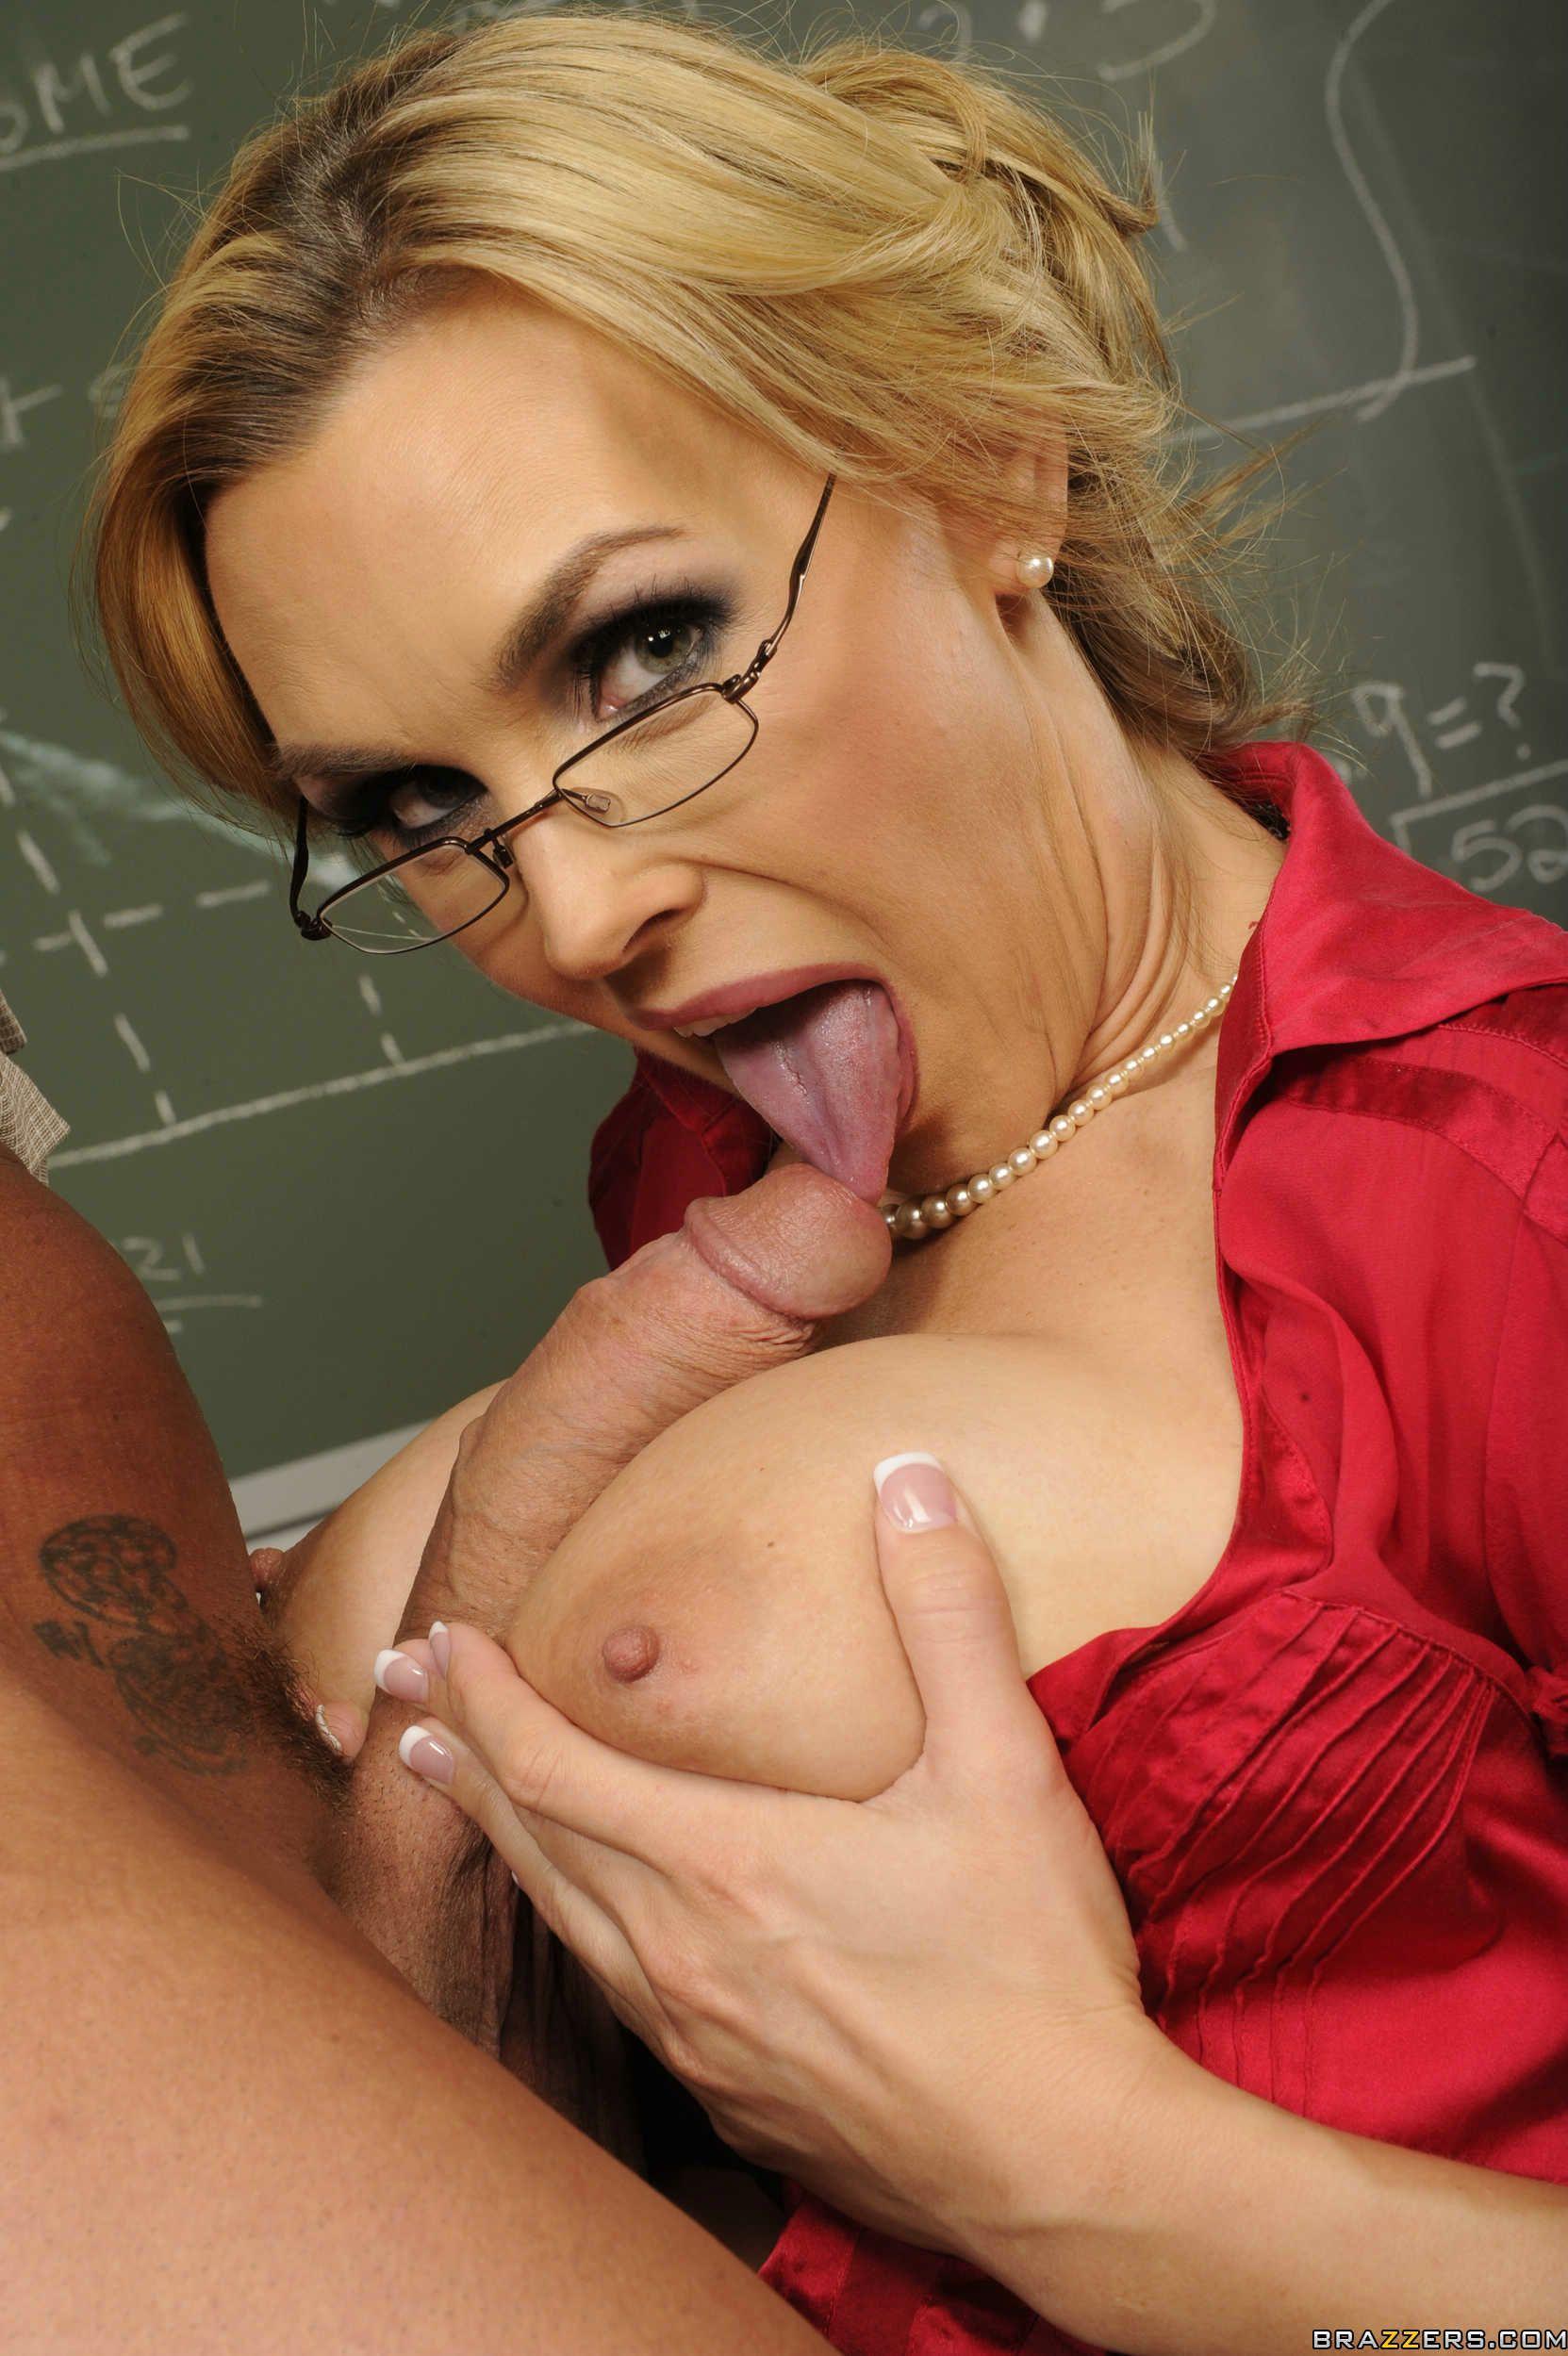 Brazzers network mckenzie lee tanya tate seek schoolgirl territory sex hd pics